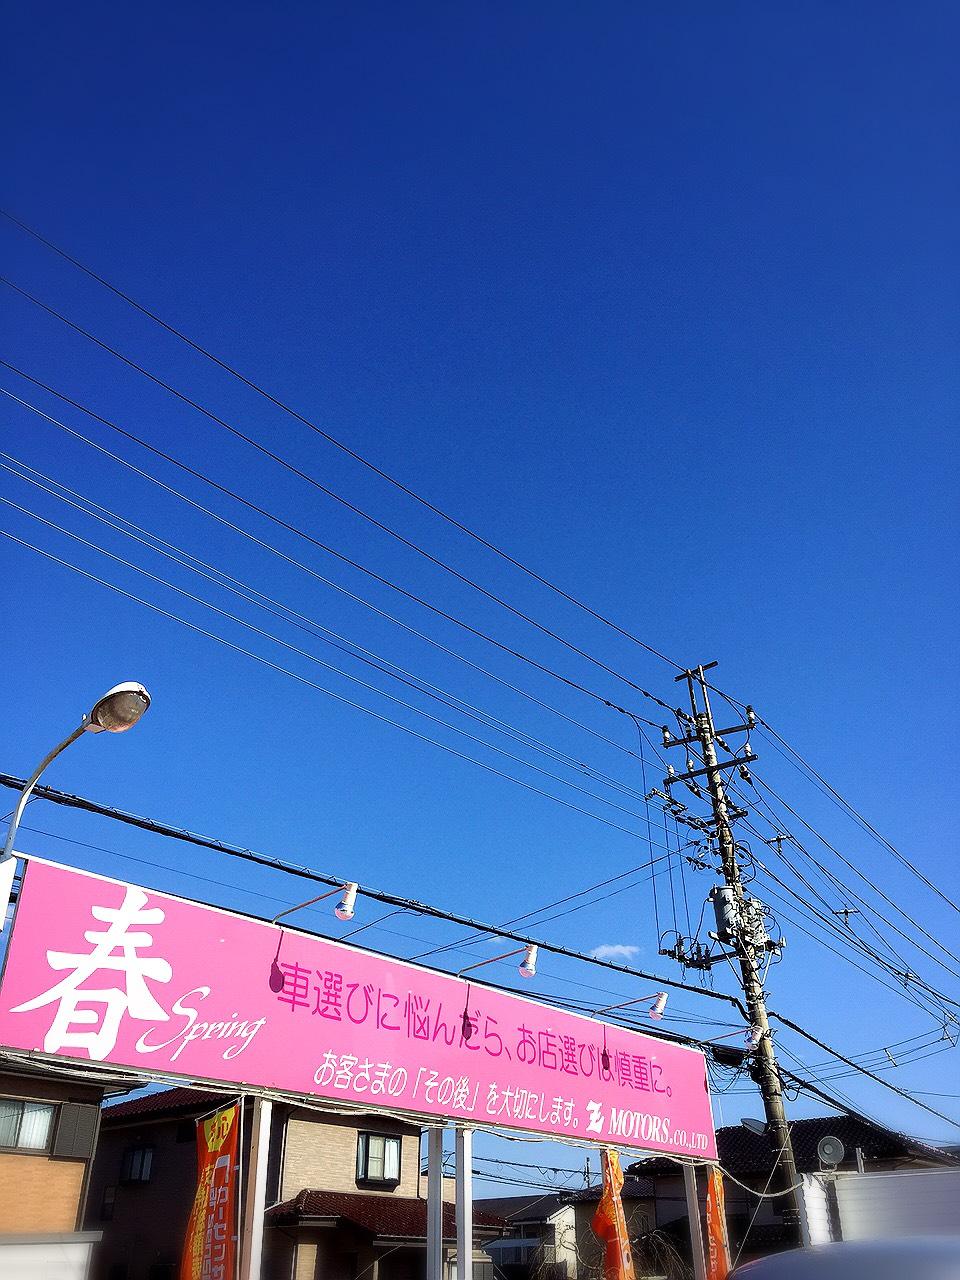 S__11255810.jpg